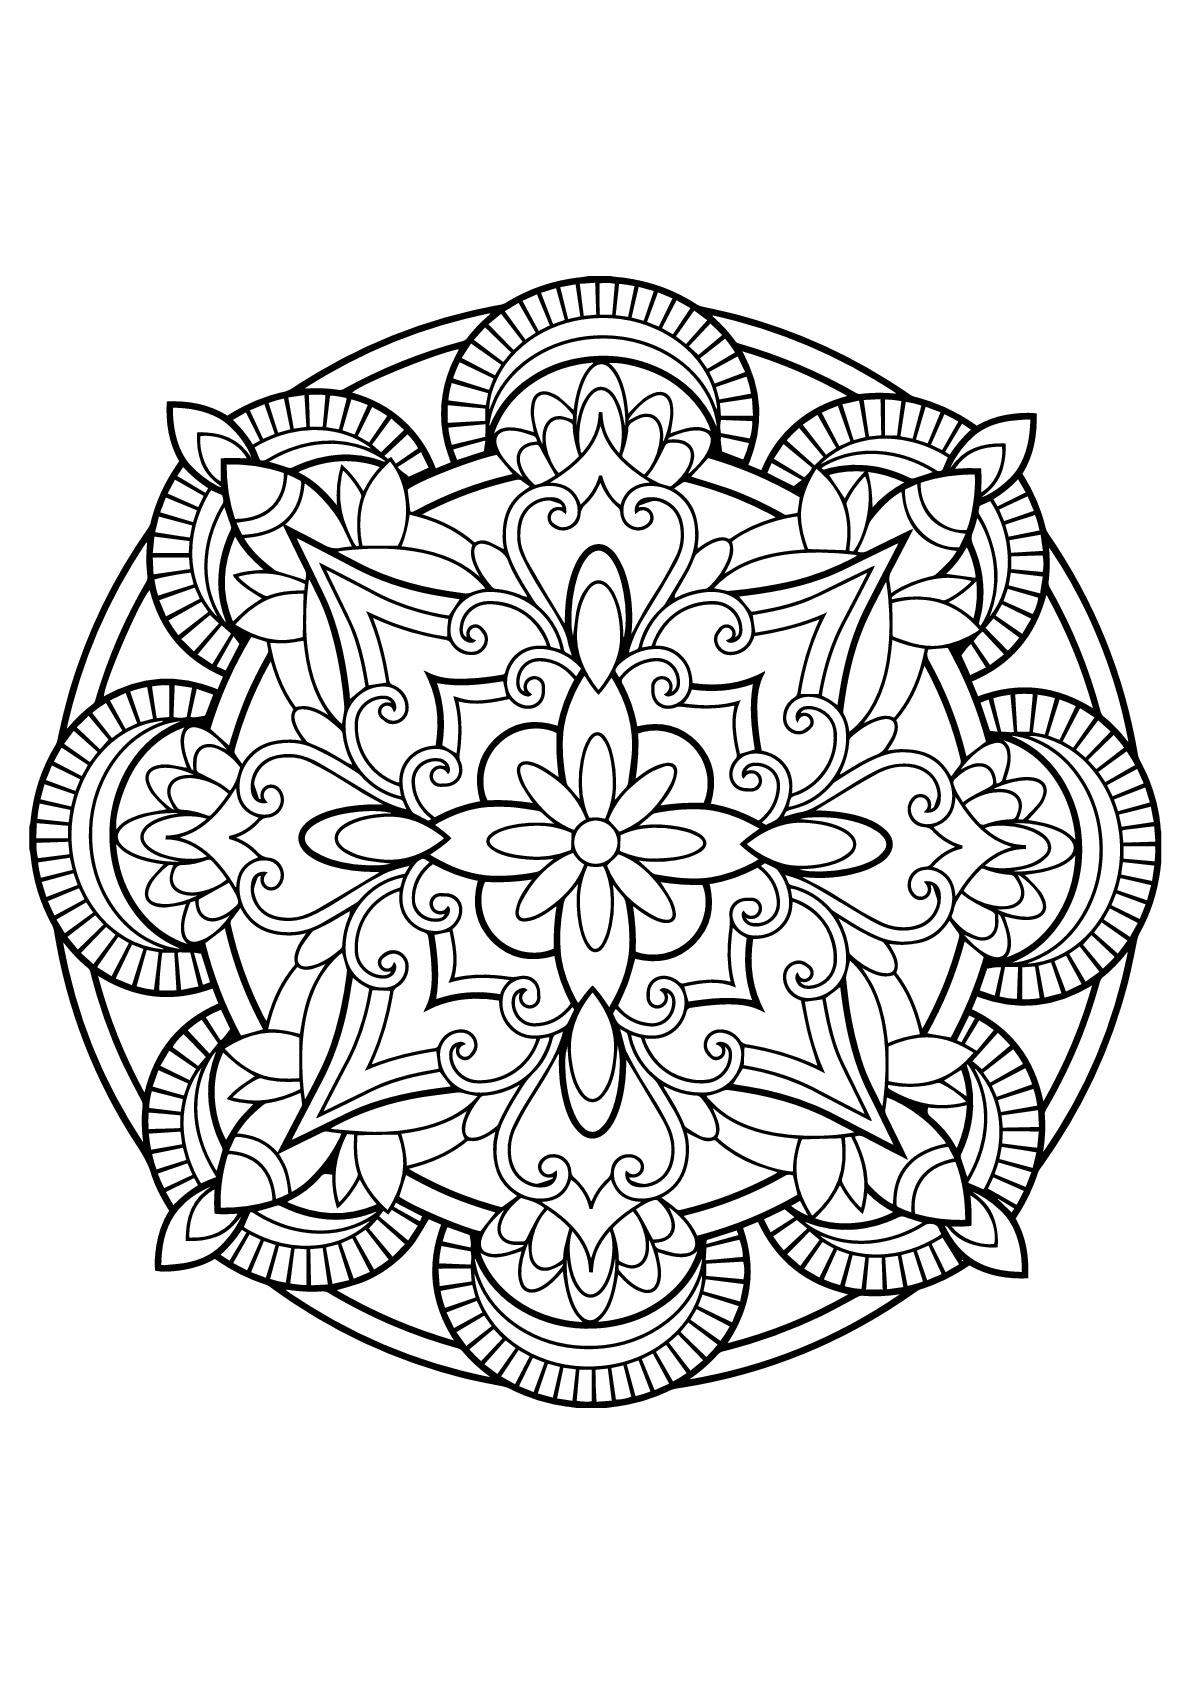 Mandala From Free Coloring Books For Adults 23 - M&alas Adult - Free Printable Mandalas